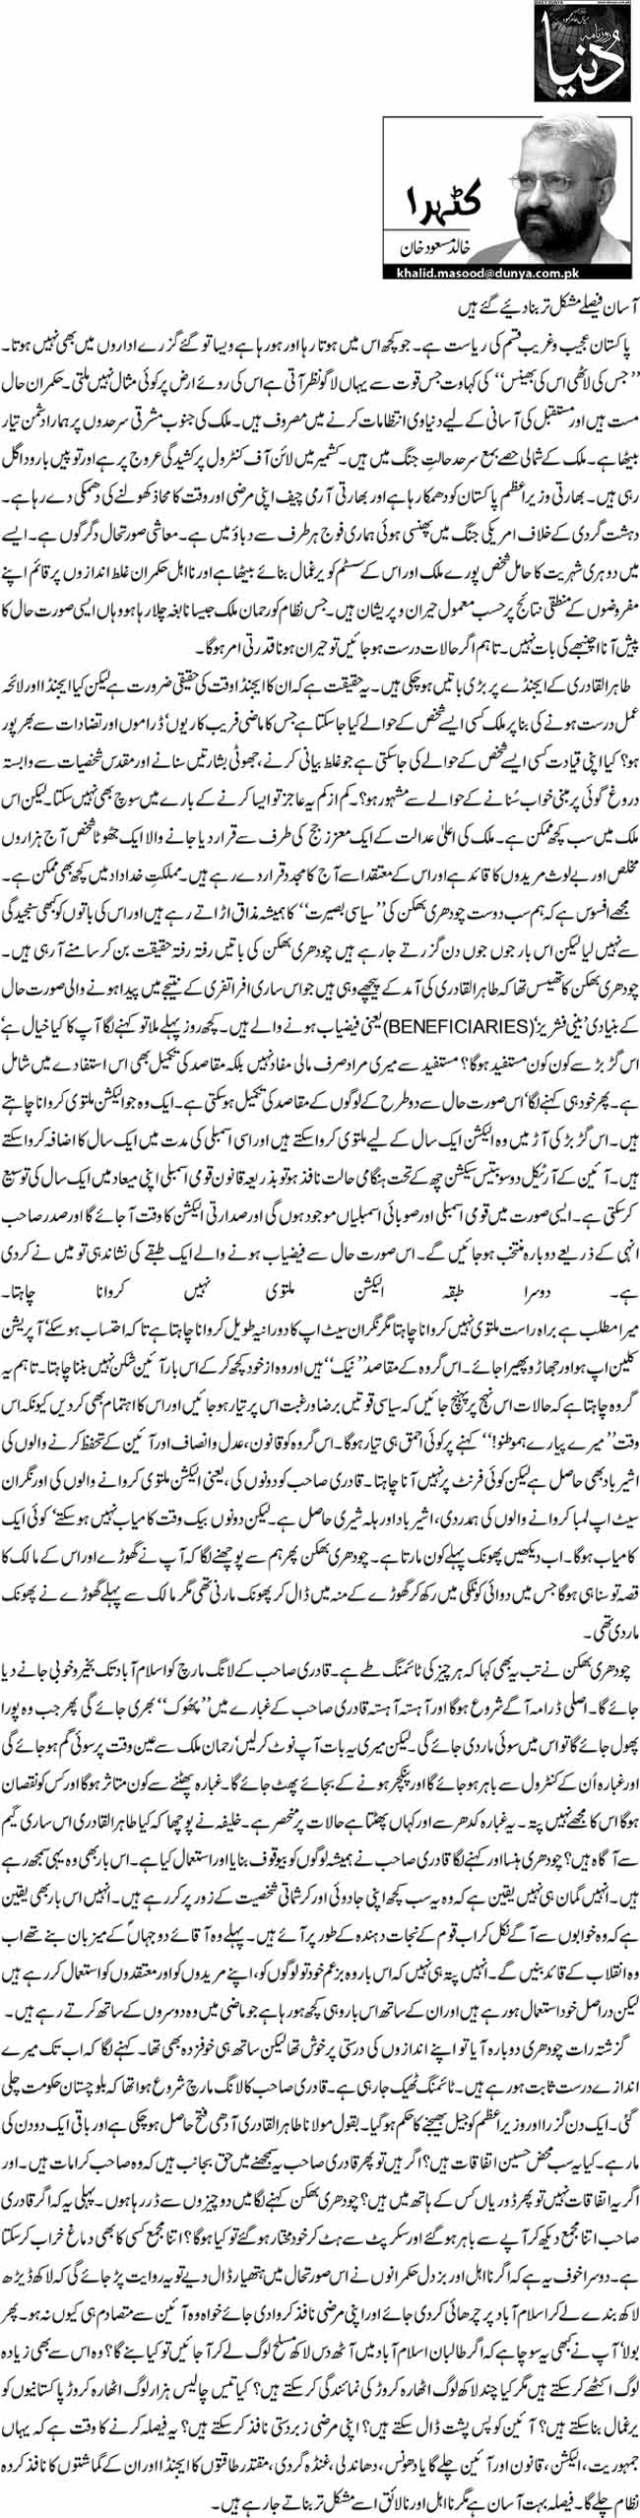 Asan faislay mushkil tar bana diay gay hain - Khalid Masood Khan